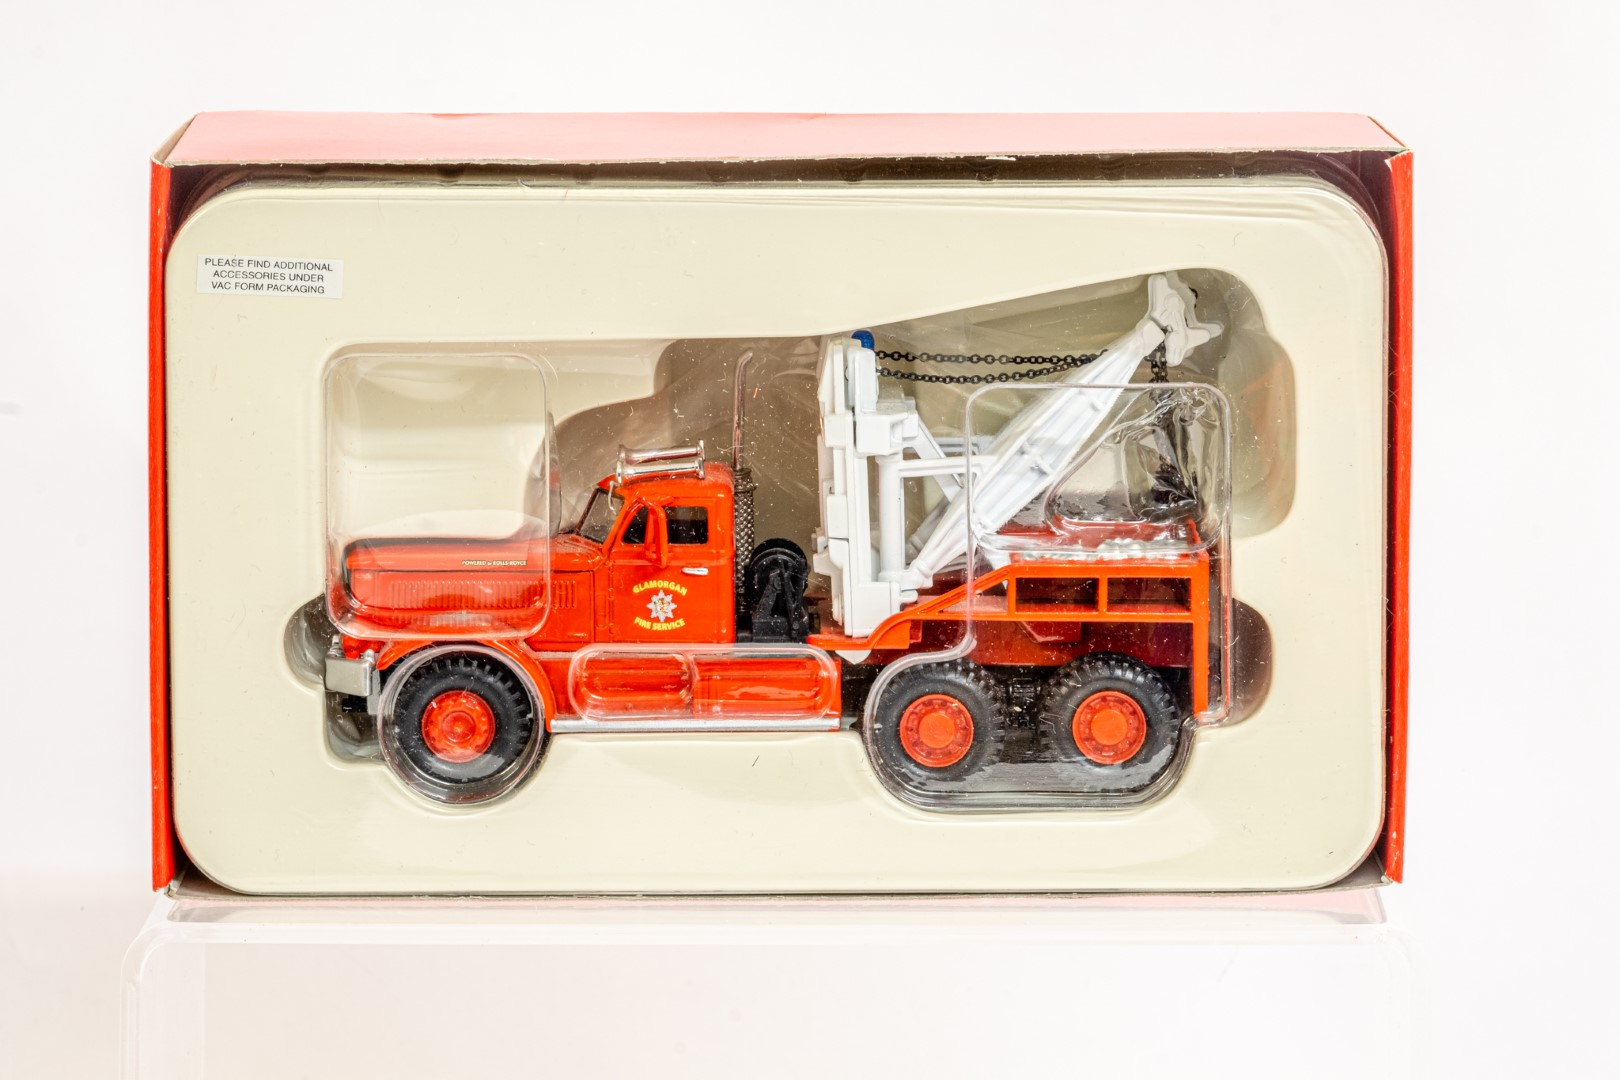 Corgi Diamond T Wrecker - Galmorgan Fire Service - Image 2 of 6